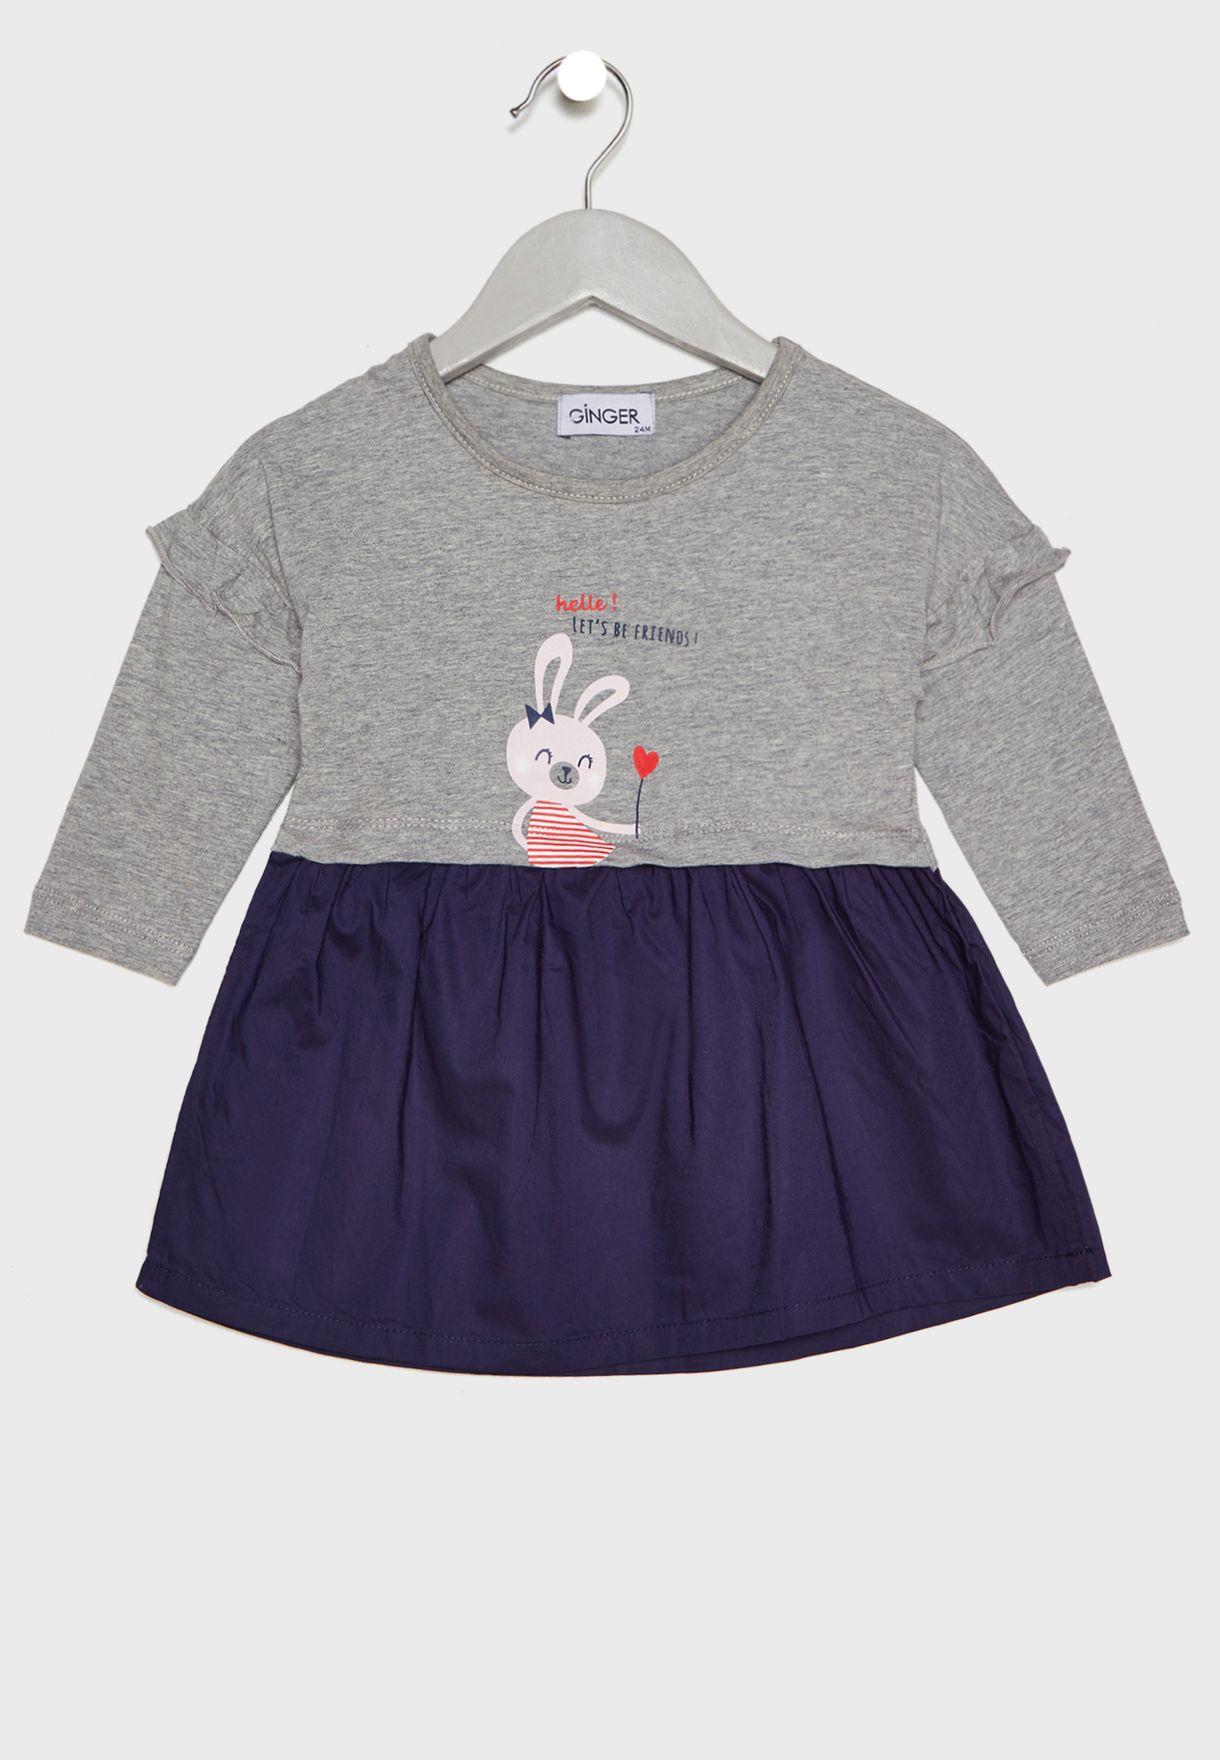 ec126959b5ae4 Shop Little Ginger multicolor Printed Dress Kid1263 for Kids in UAE -  17736AT35SDP